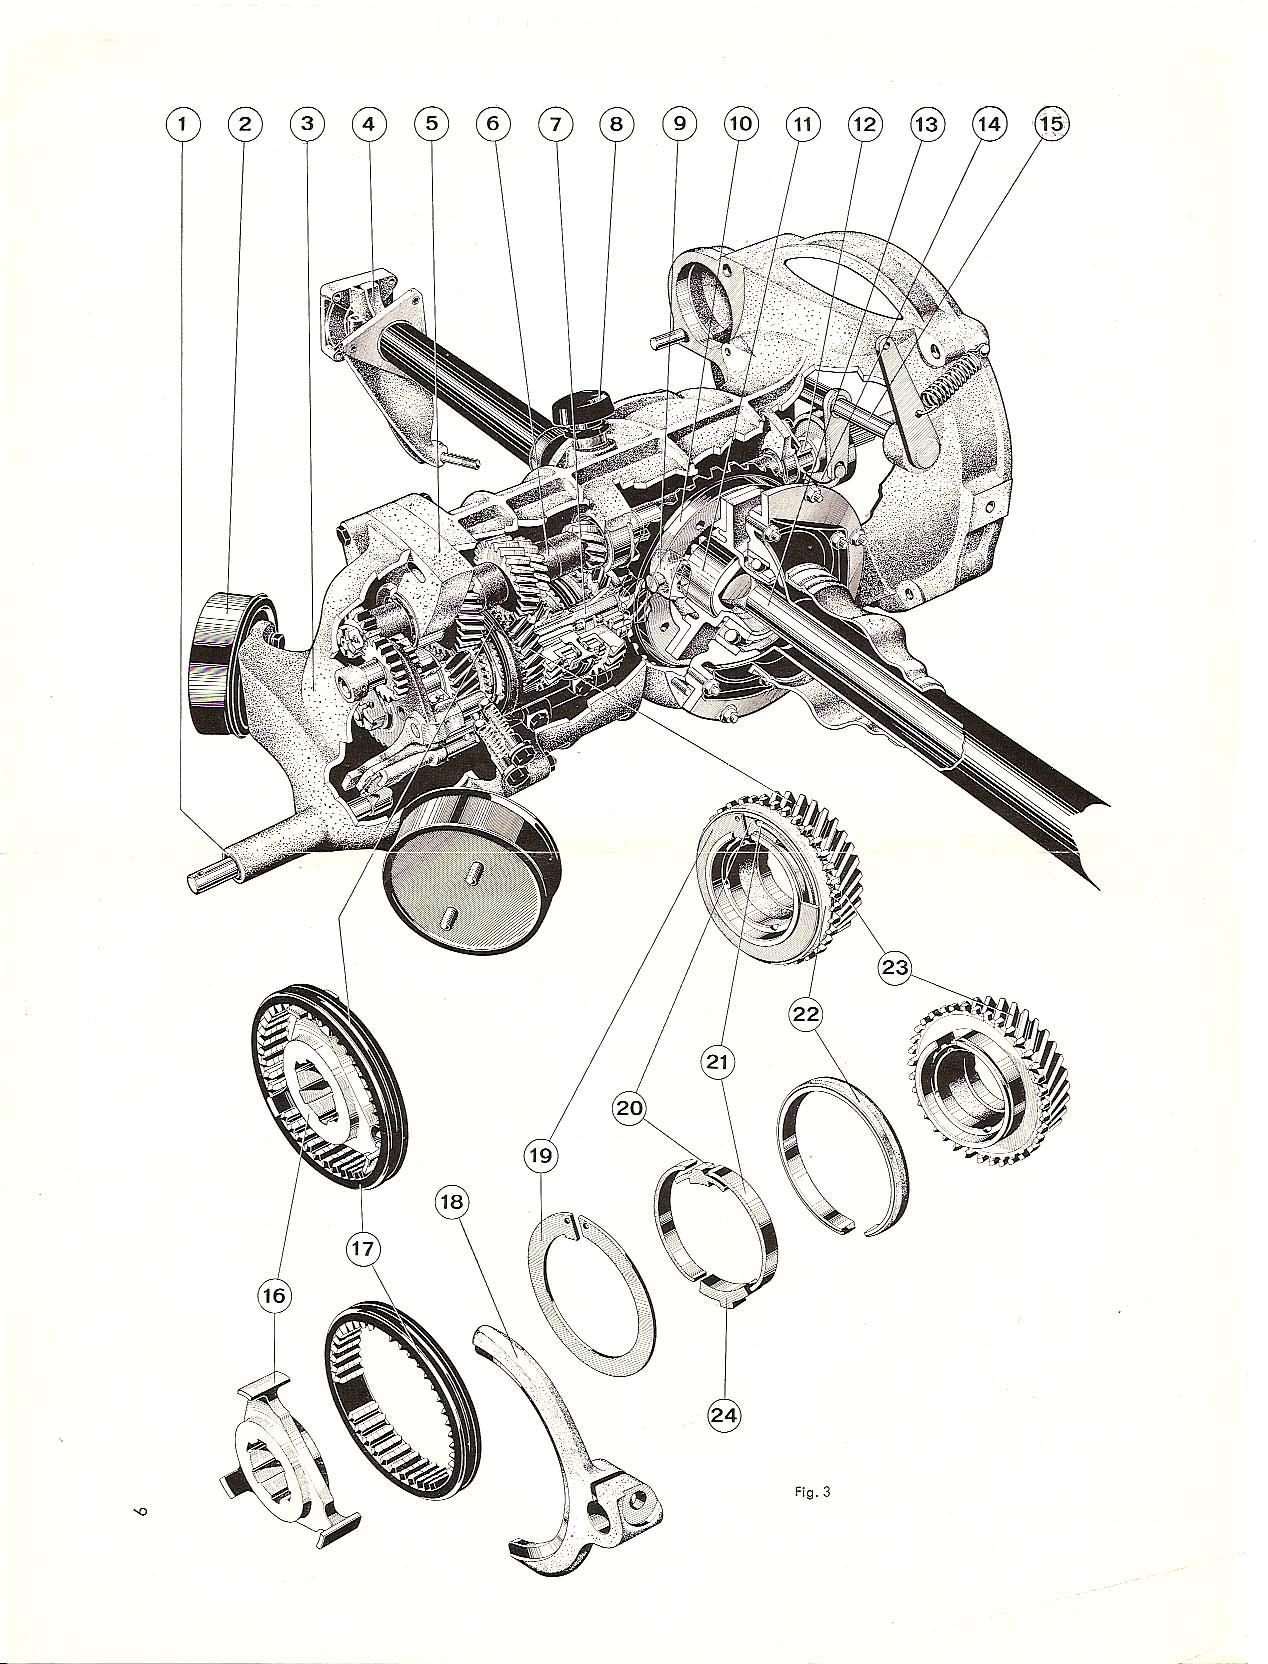 356B Drivers Manual 1960 Edition